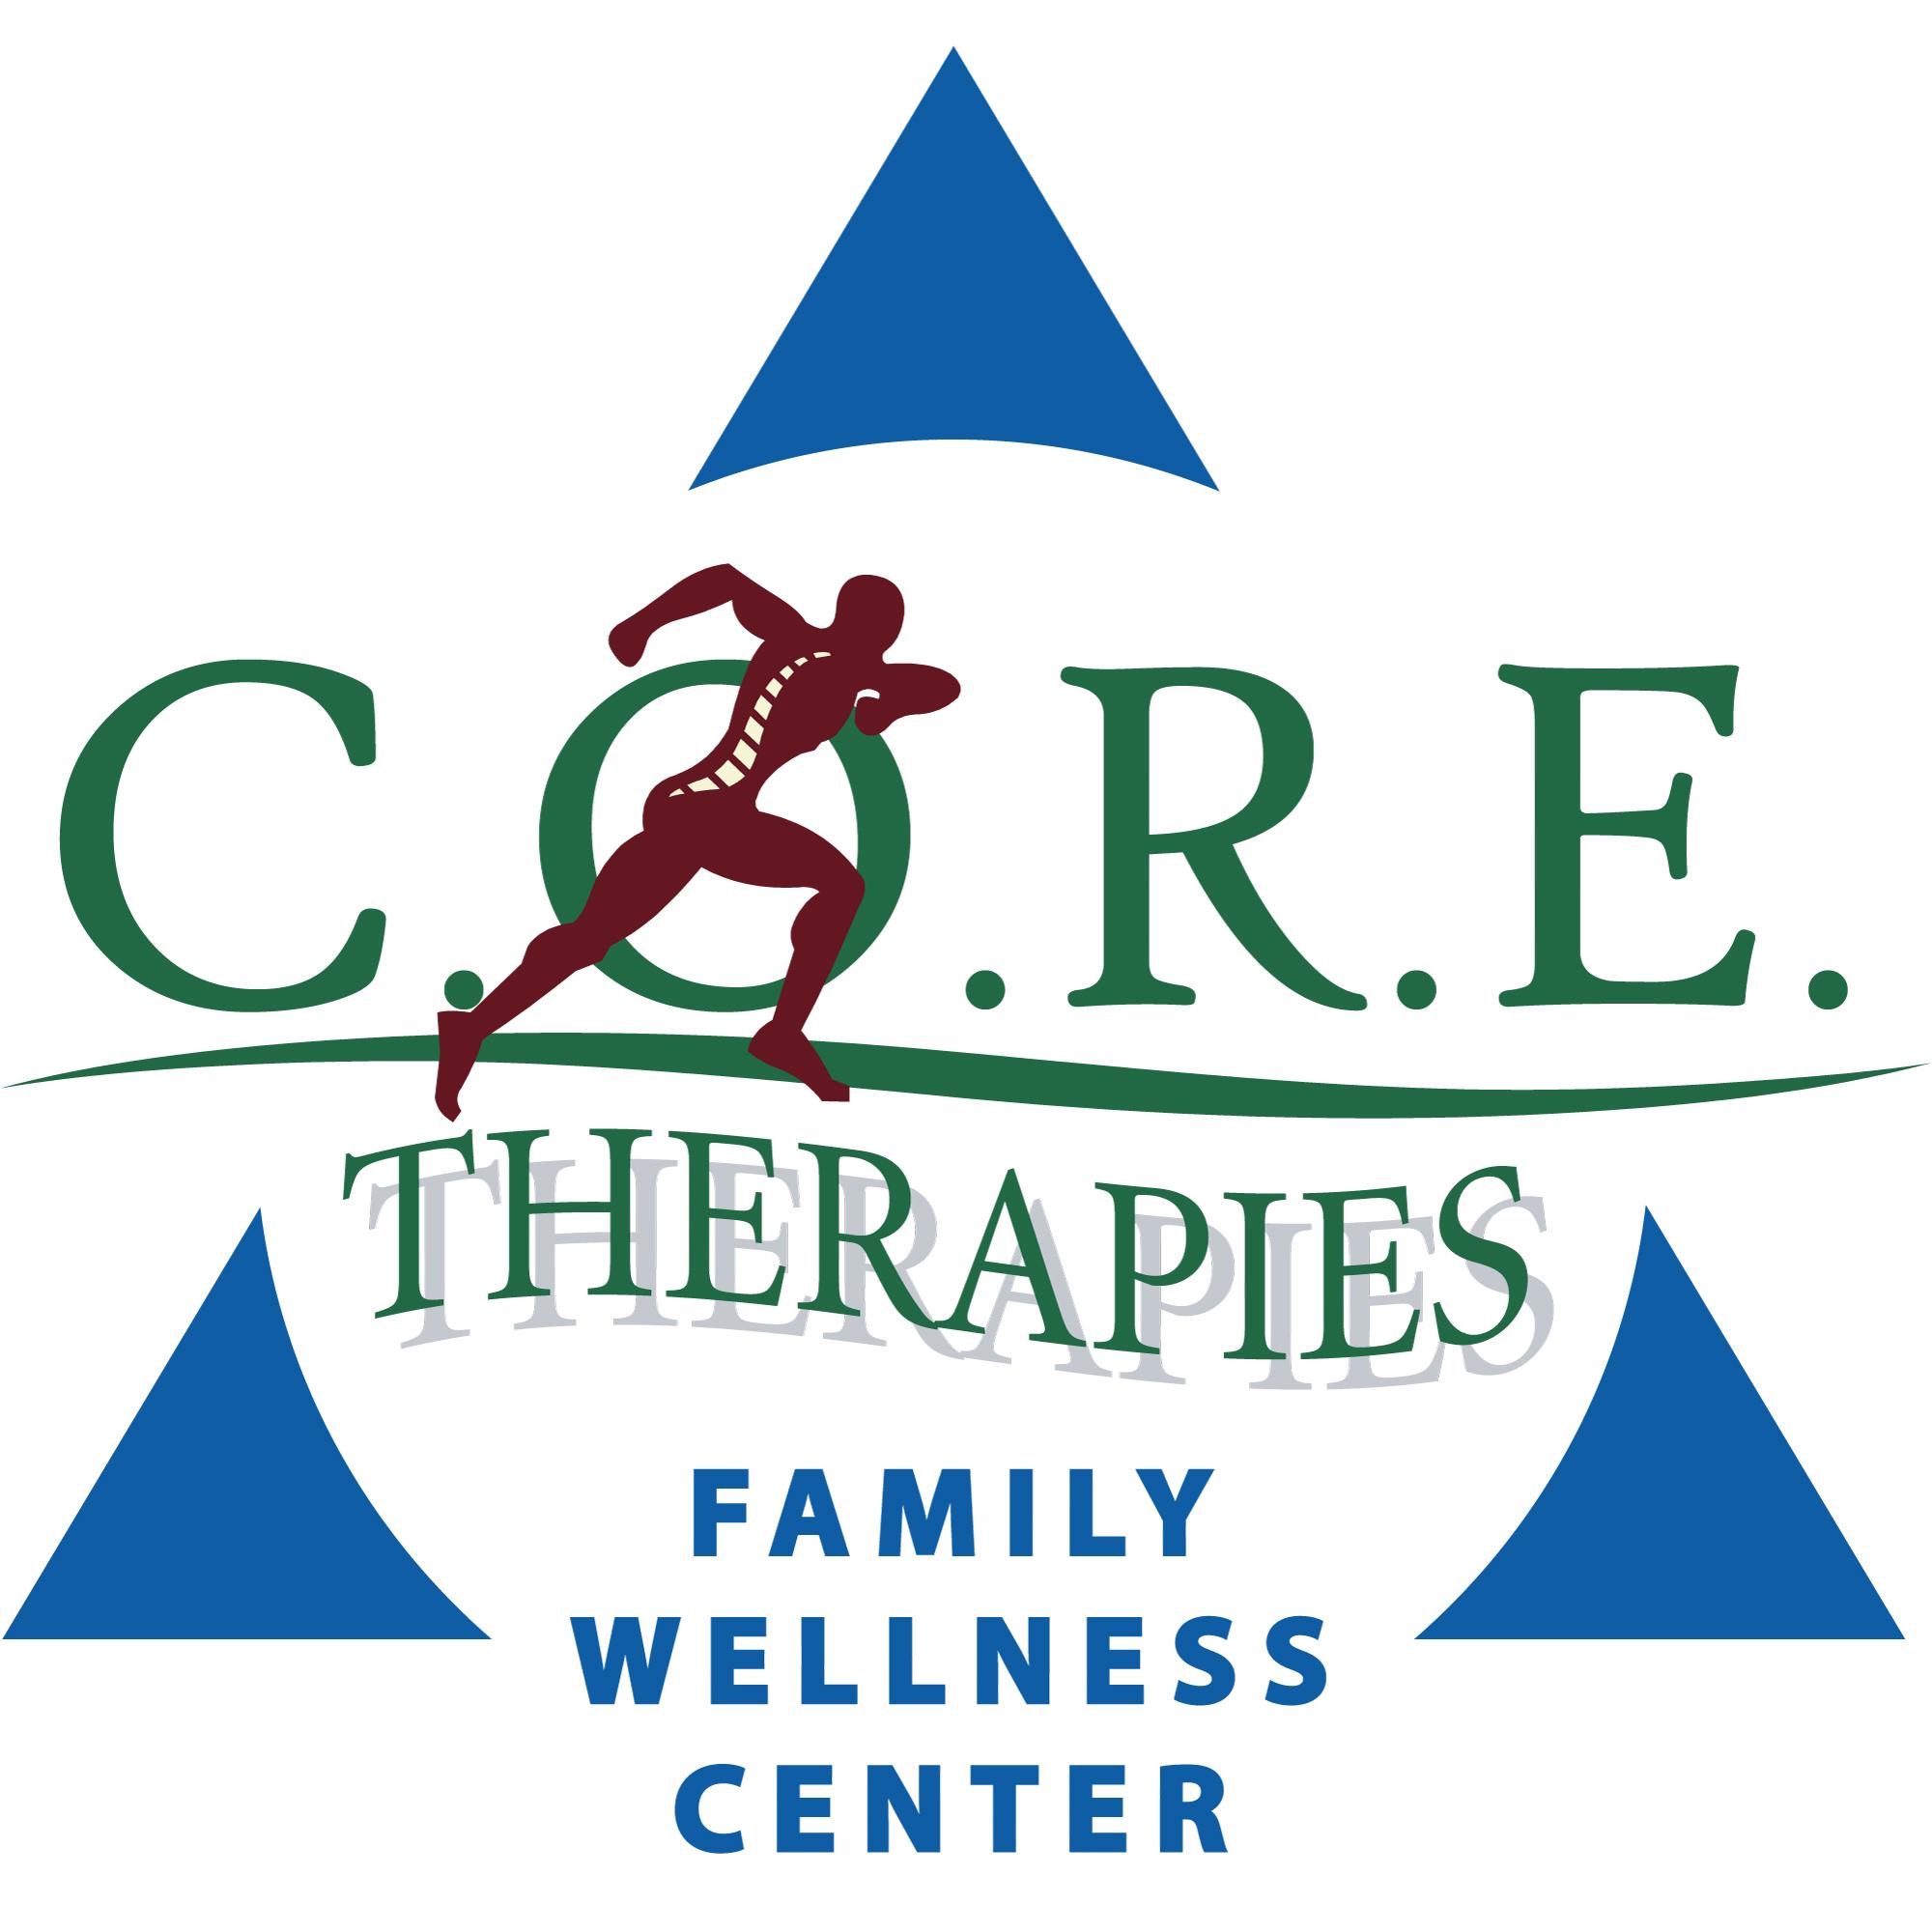 Core Therapies Wellness